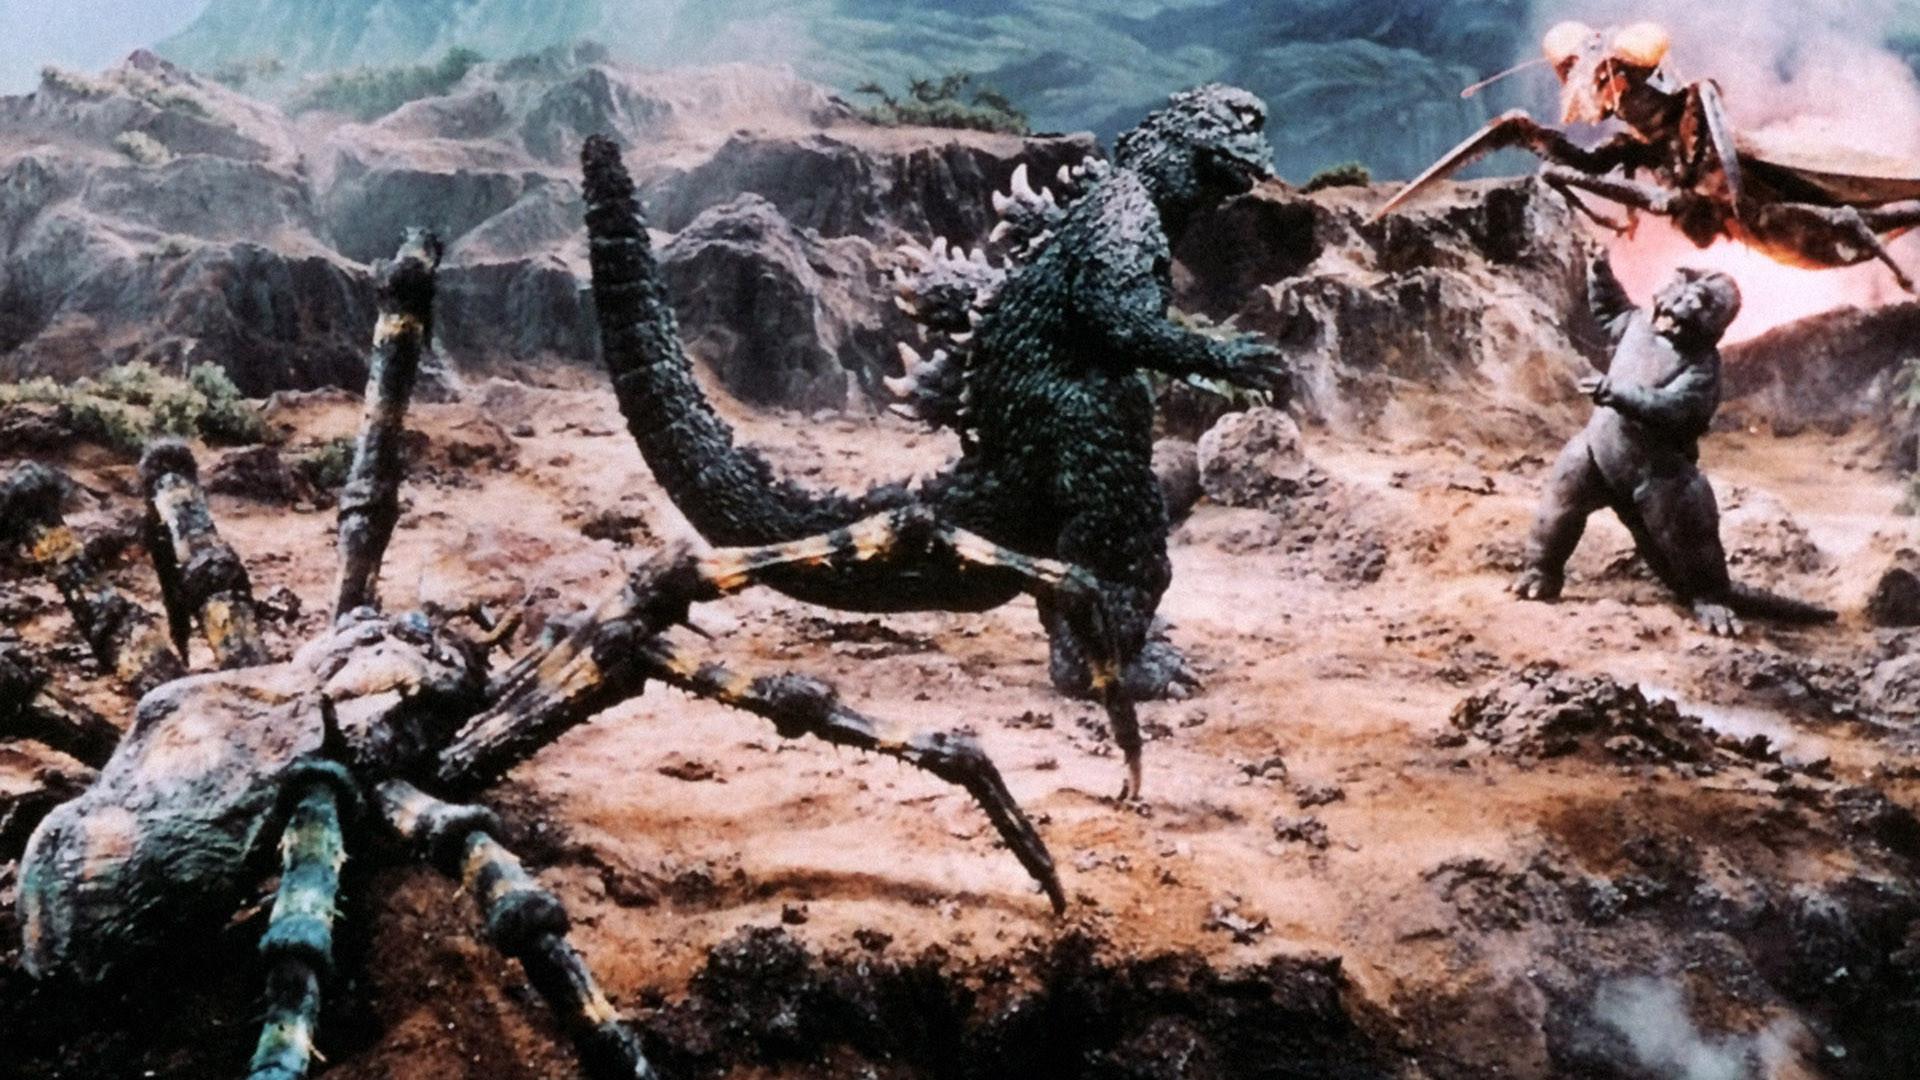 Res: 1920x1080, Son-of-Godzilla-Wallpapers-2.jpg